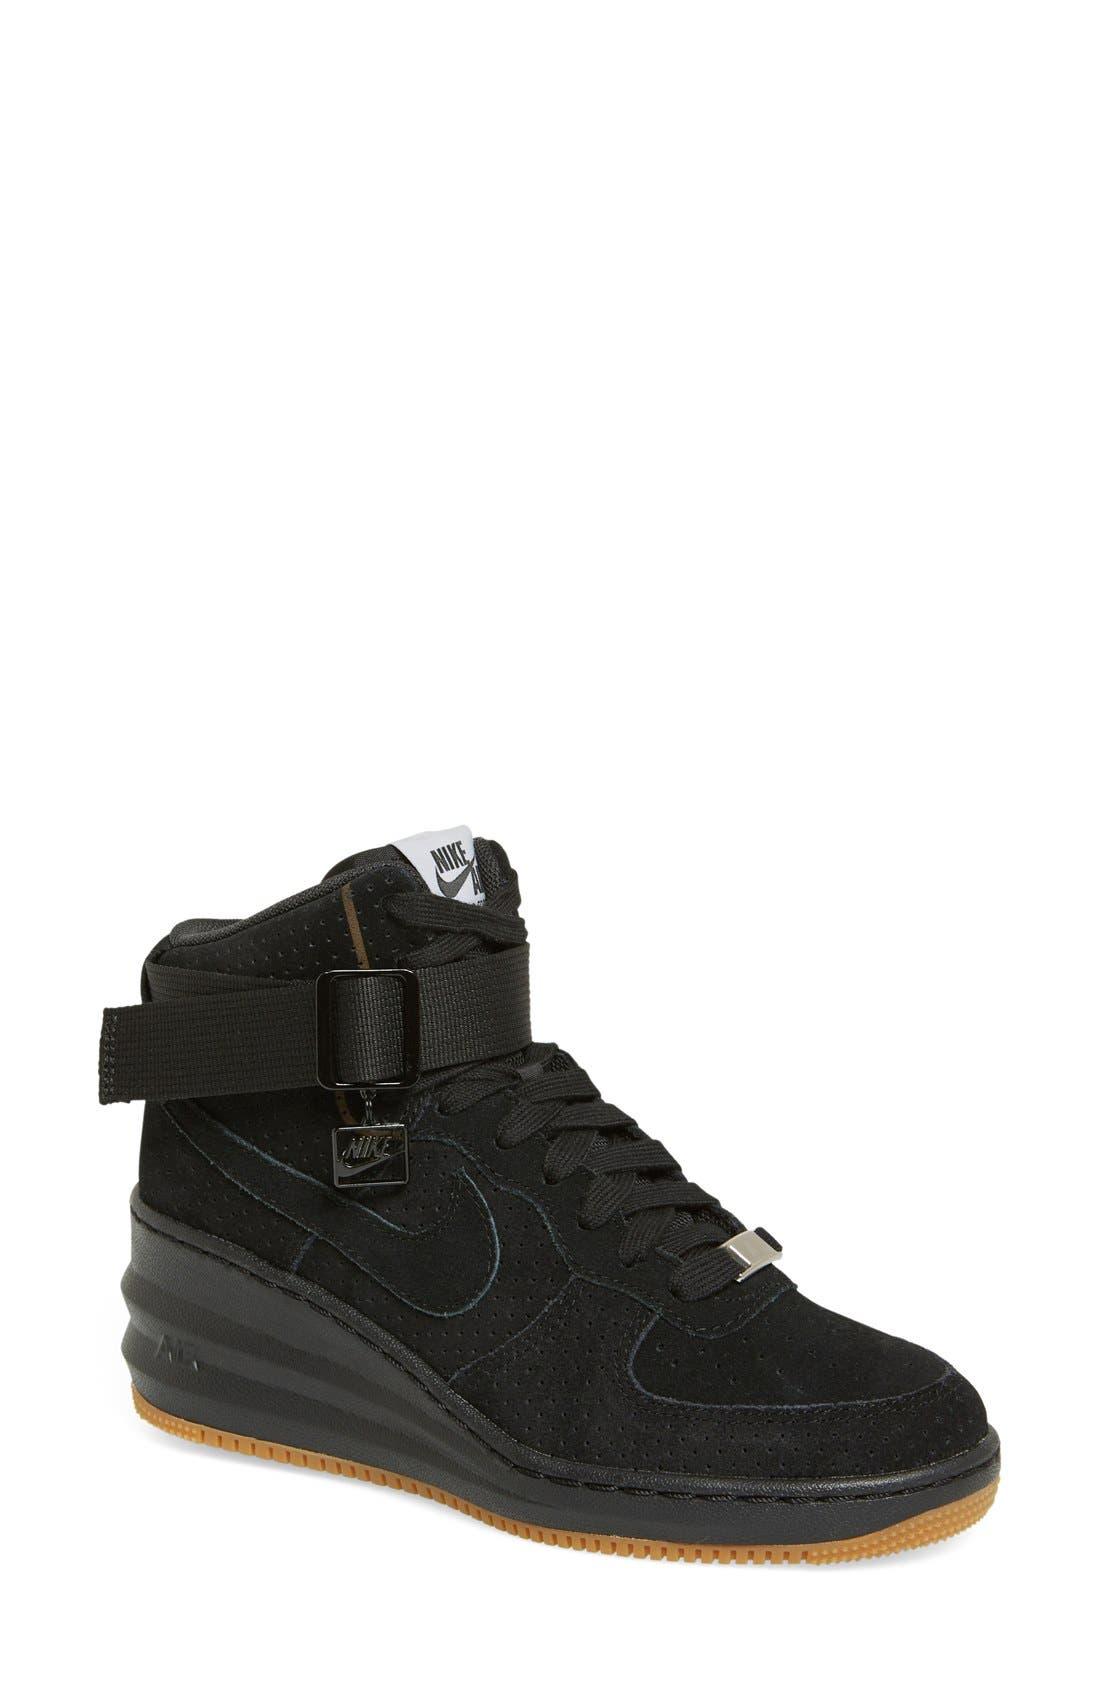 Alternate Image 1 Selected - Nike 'Lunar Force Sky Hi' Wedge Sneaker (Women)